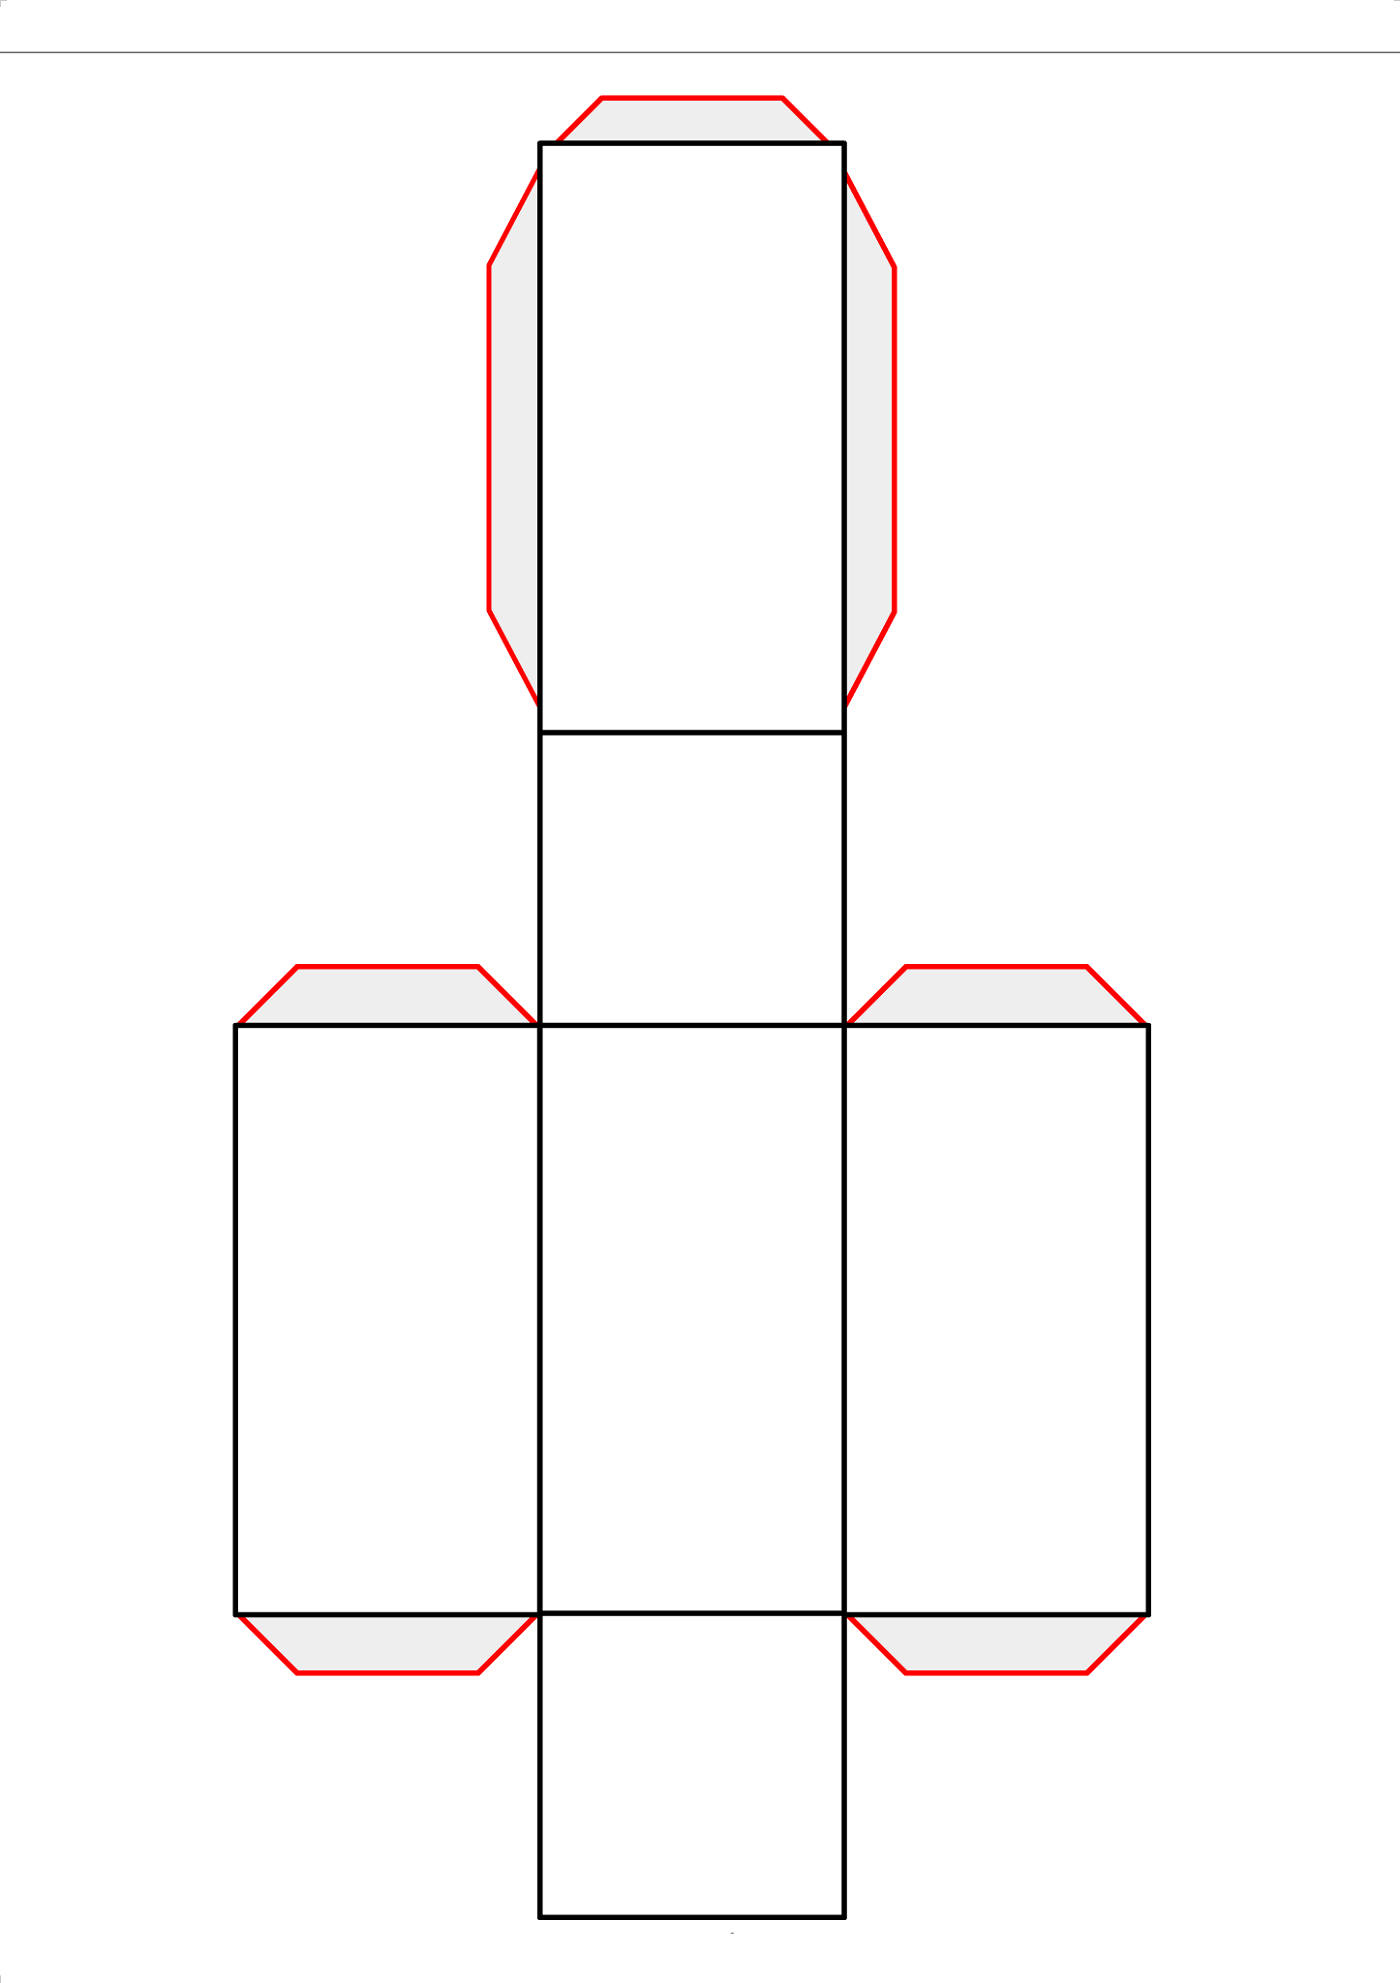 Rectangular Prism Net Image Learning Printable